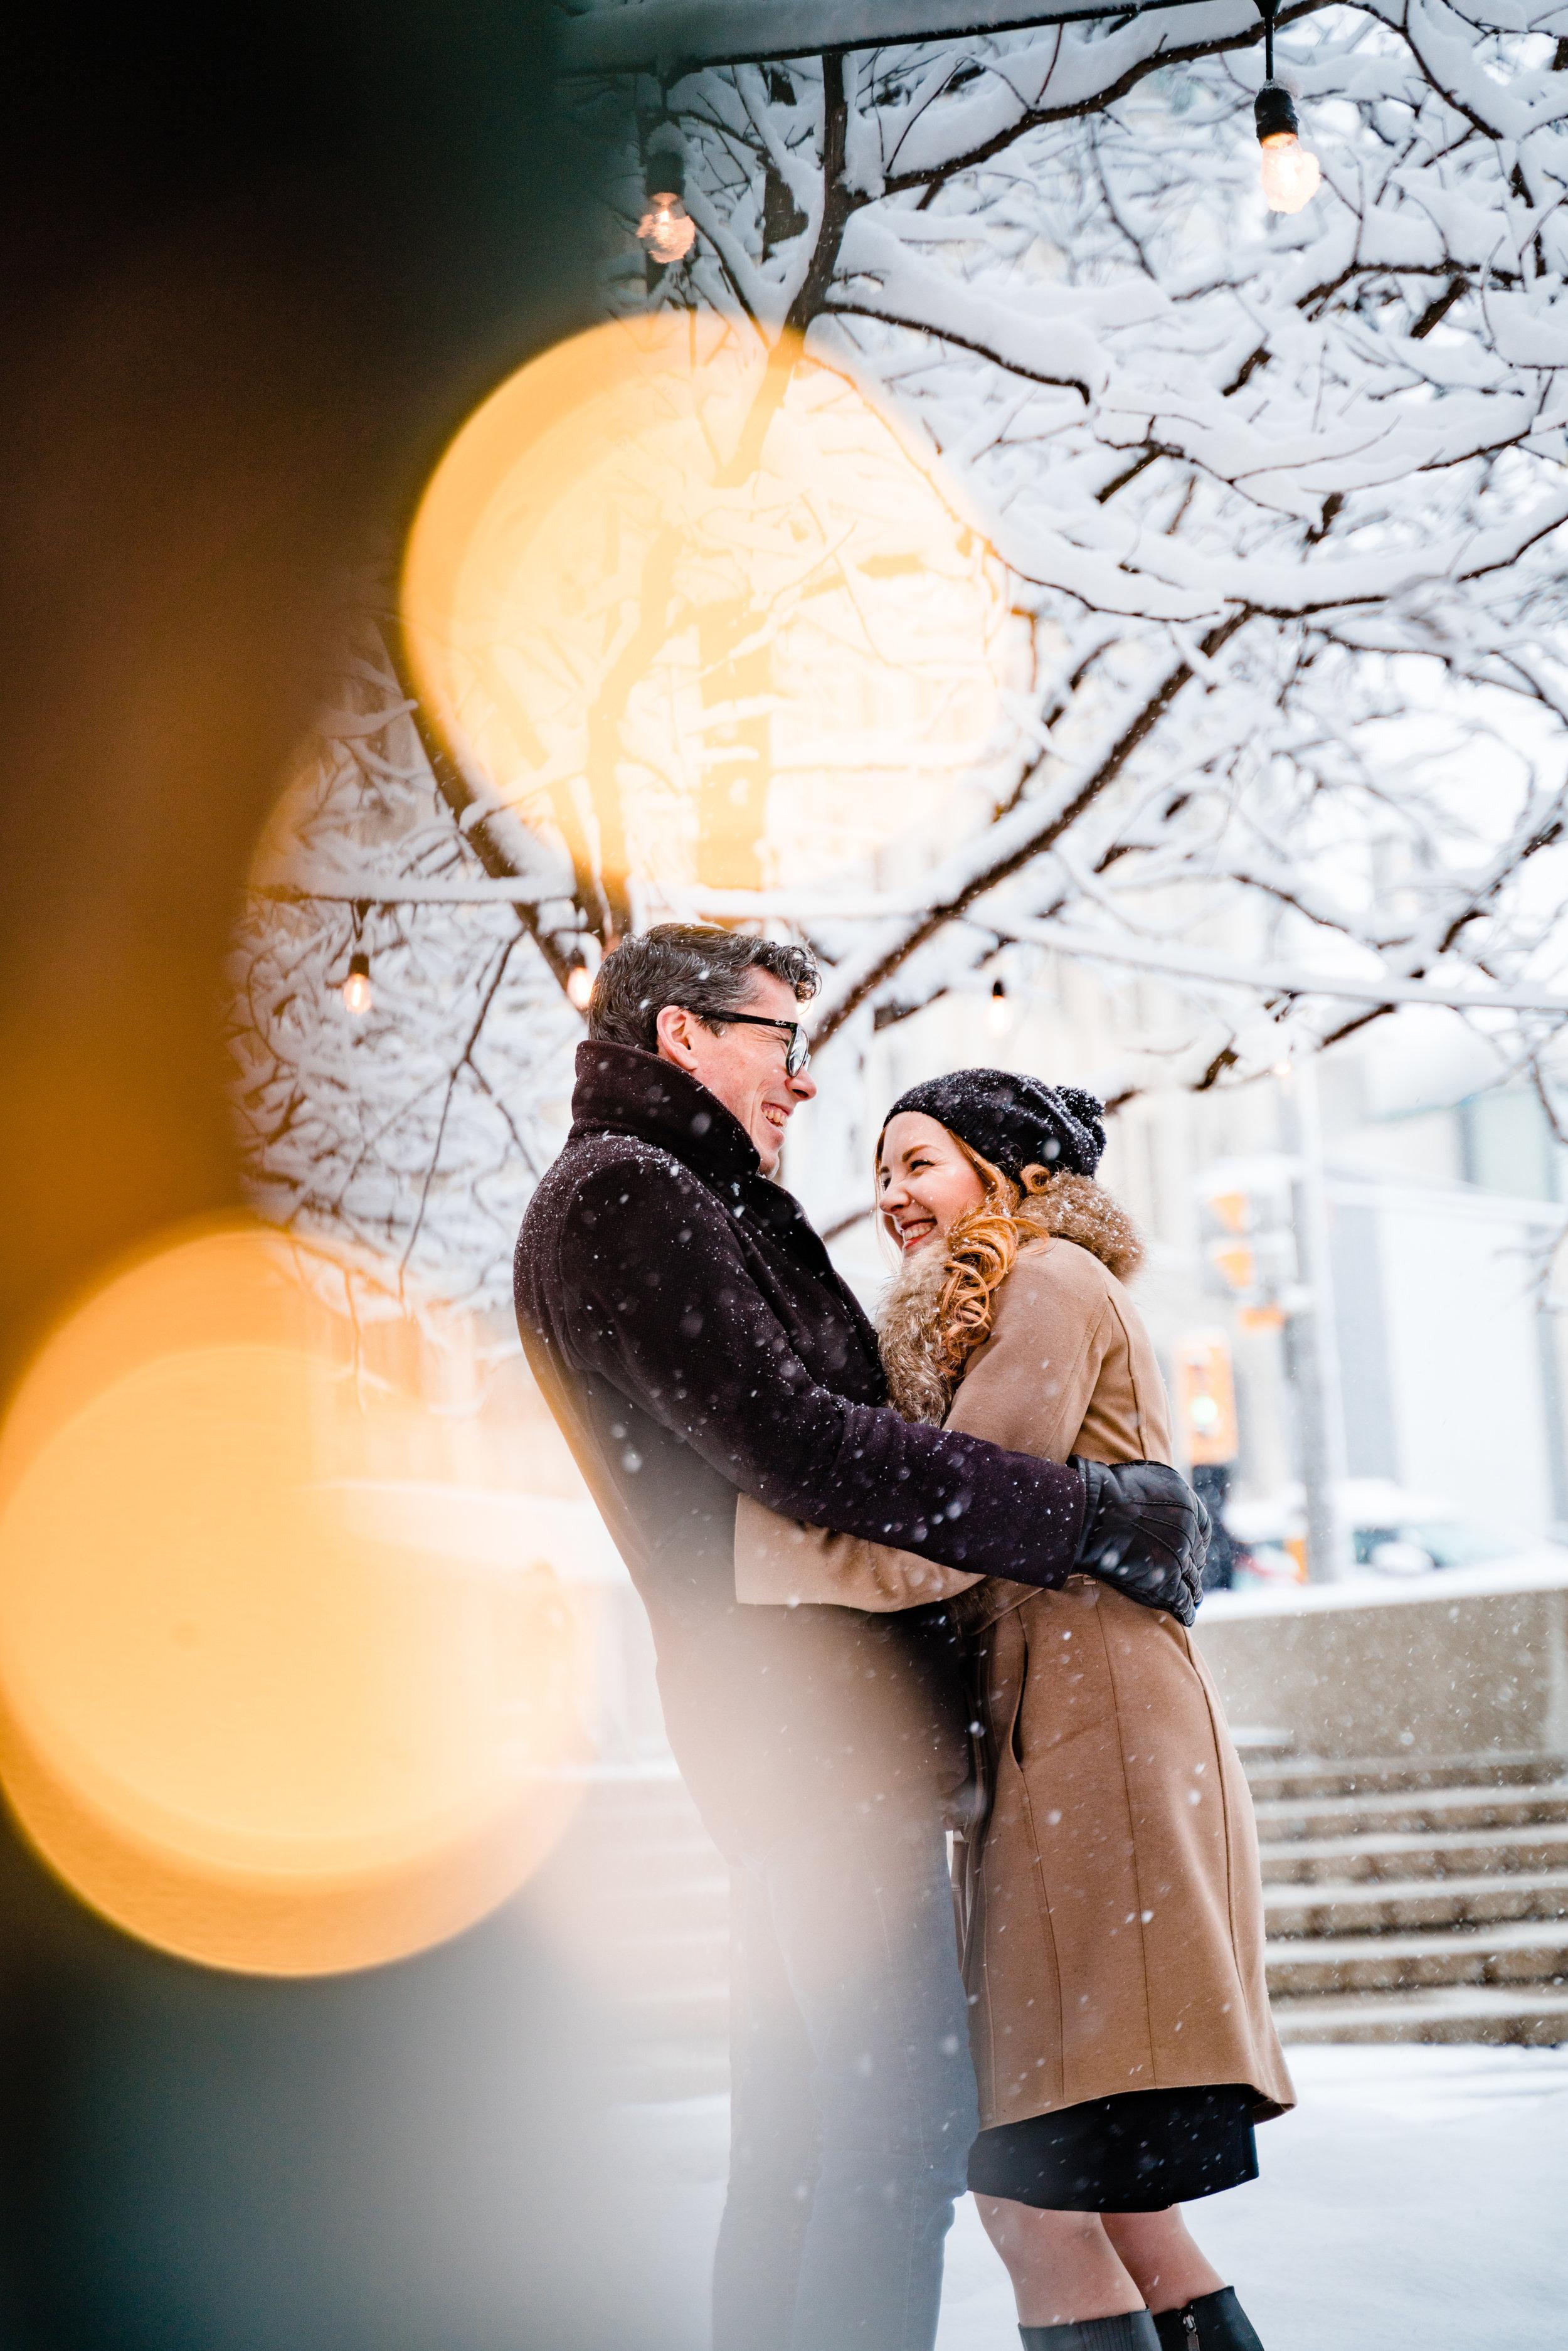 Anna&Chris (7 of 37)ottawa-ontario-engagementphotography-wedding-foxandfellow-winter.jpg